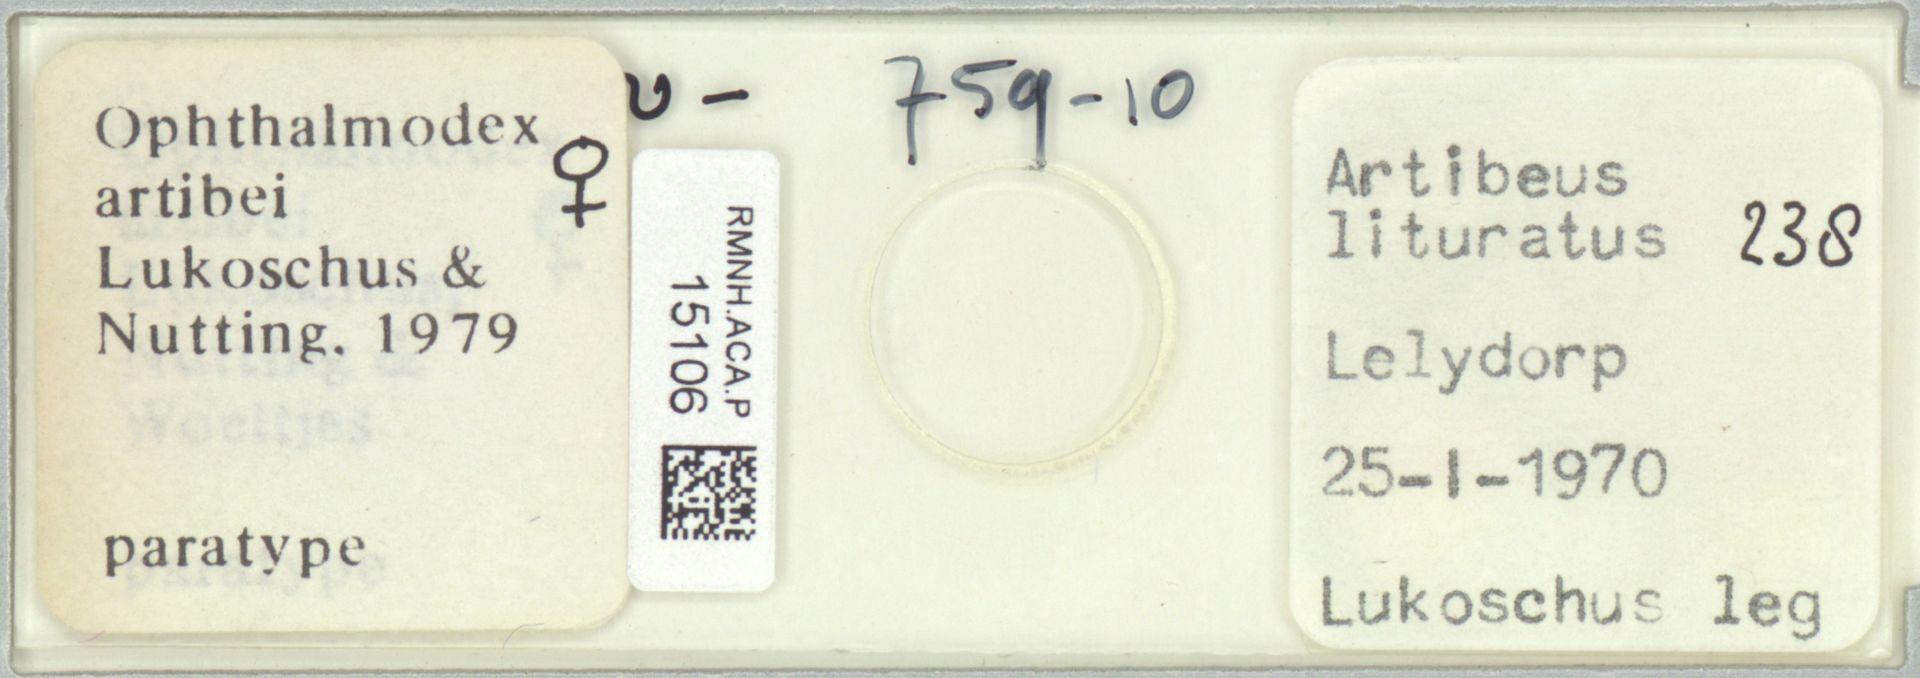 RMNH.ACA.P.15106 | Ophthalmodex artibei Lukoschus & Nutting, 1979